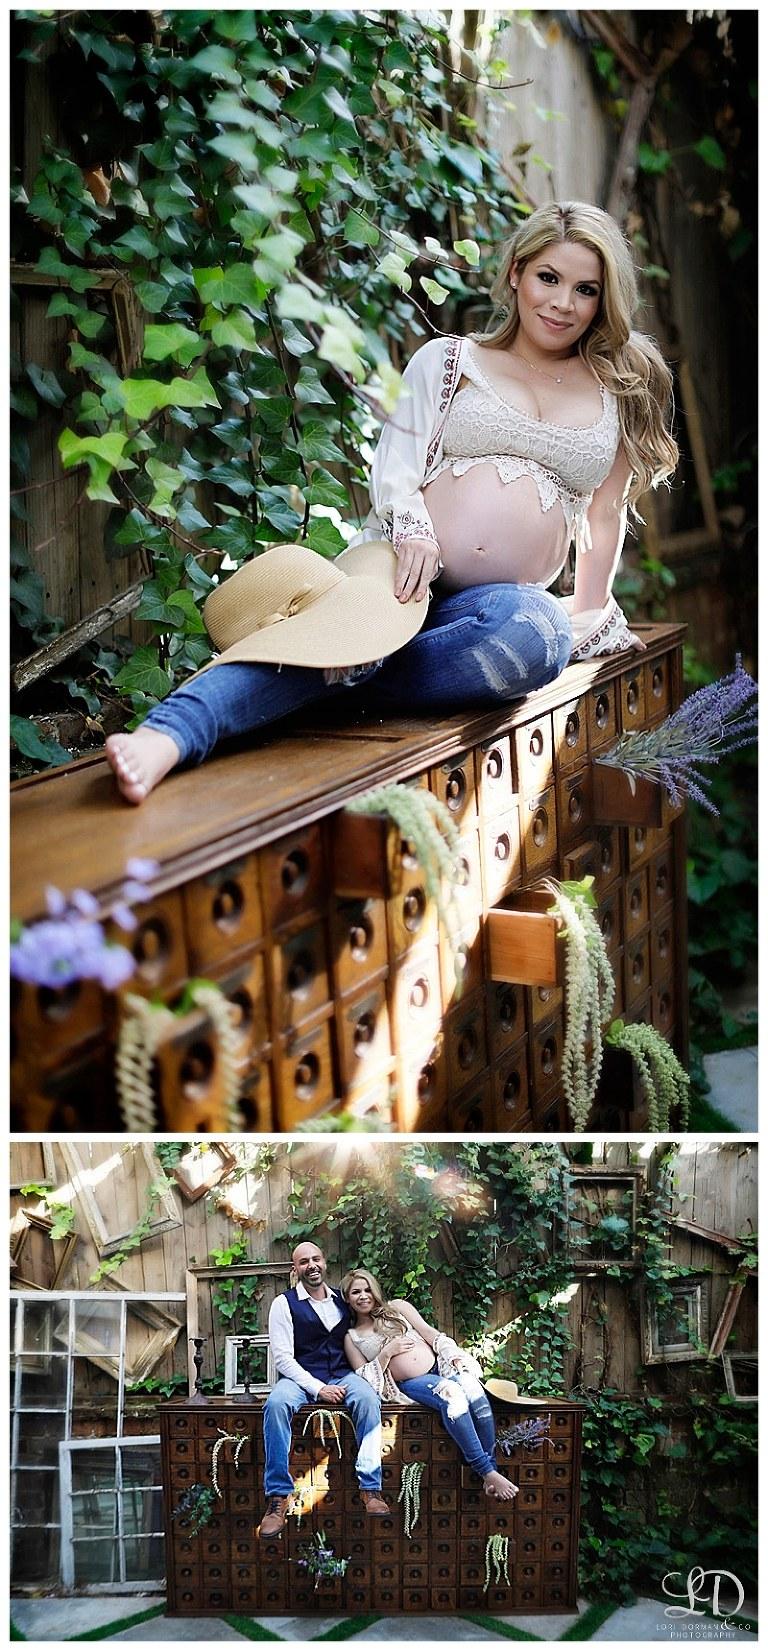 sweet maternity photoshoot-lori dorman photography-maternity boudoir-professional photographer_5148.jpg